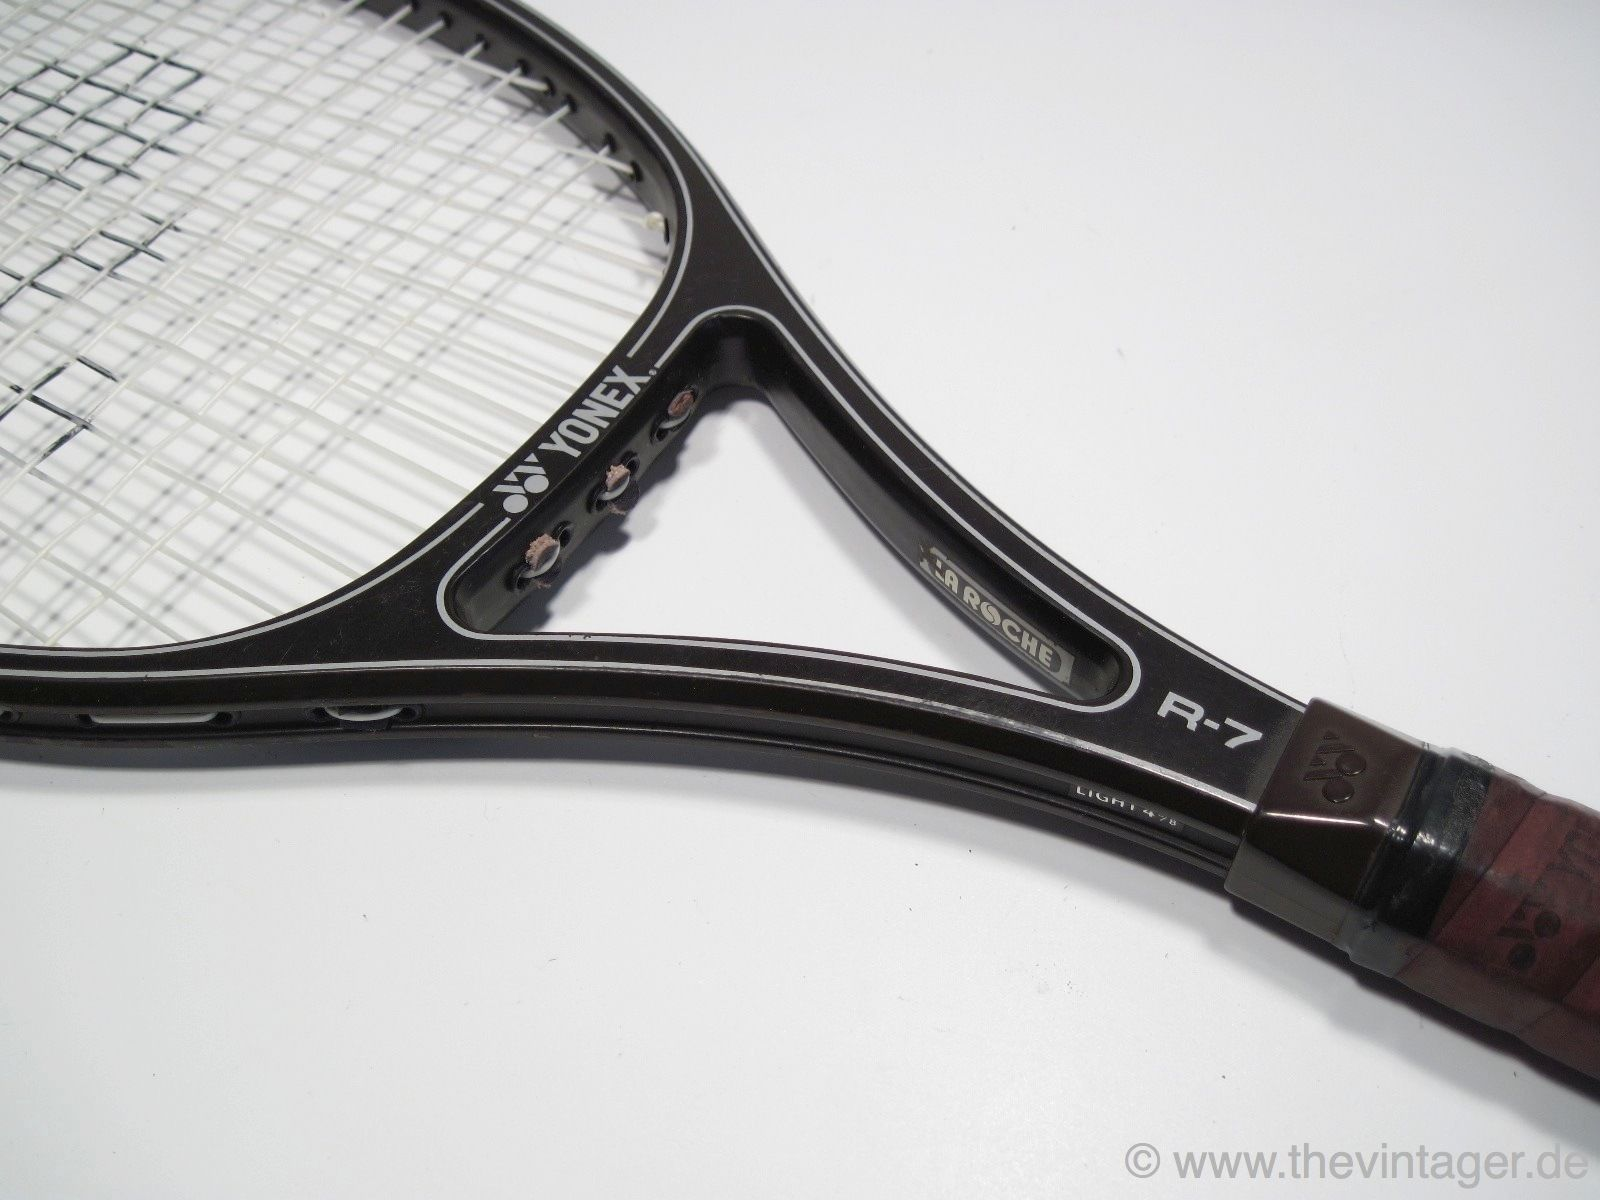 Vtg 80s Yonex R 7 Rexking Racket Martina Navratilova R Garros Wimbledon 22 27 Martina Navratilova Rackets Yonex